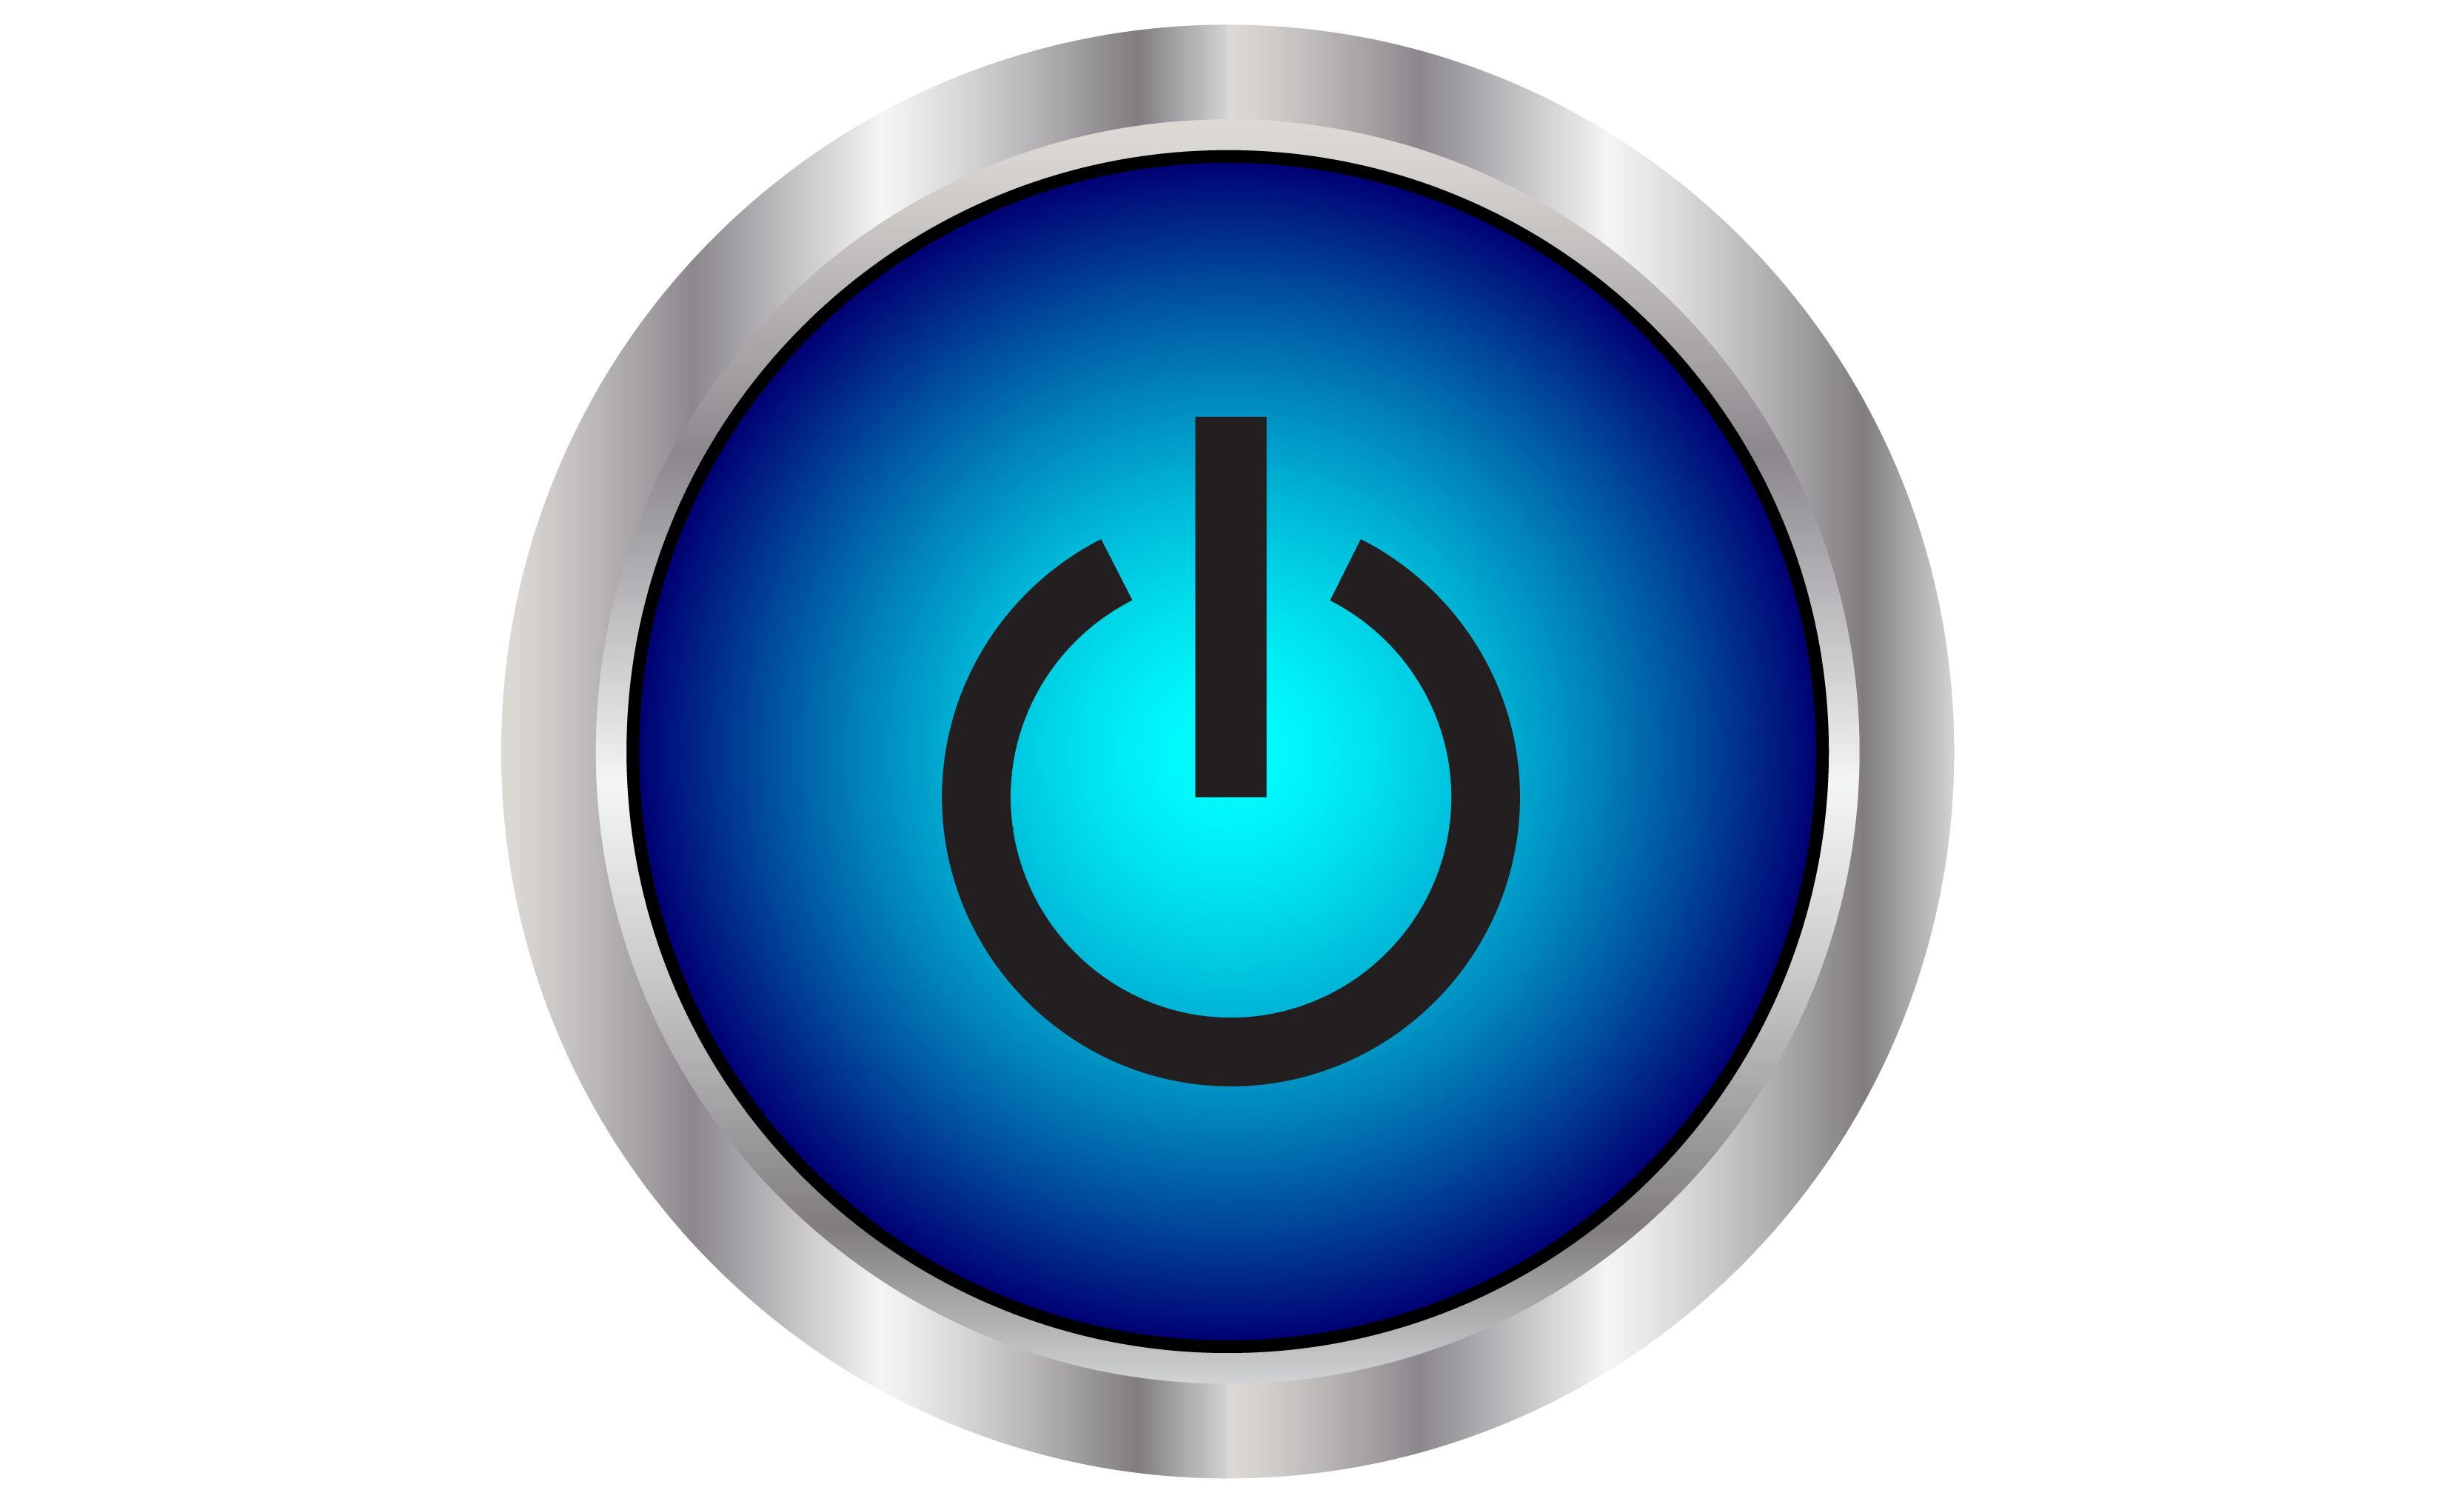 Power Button 4k